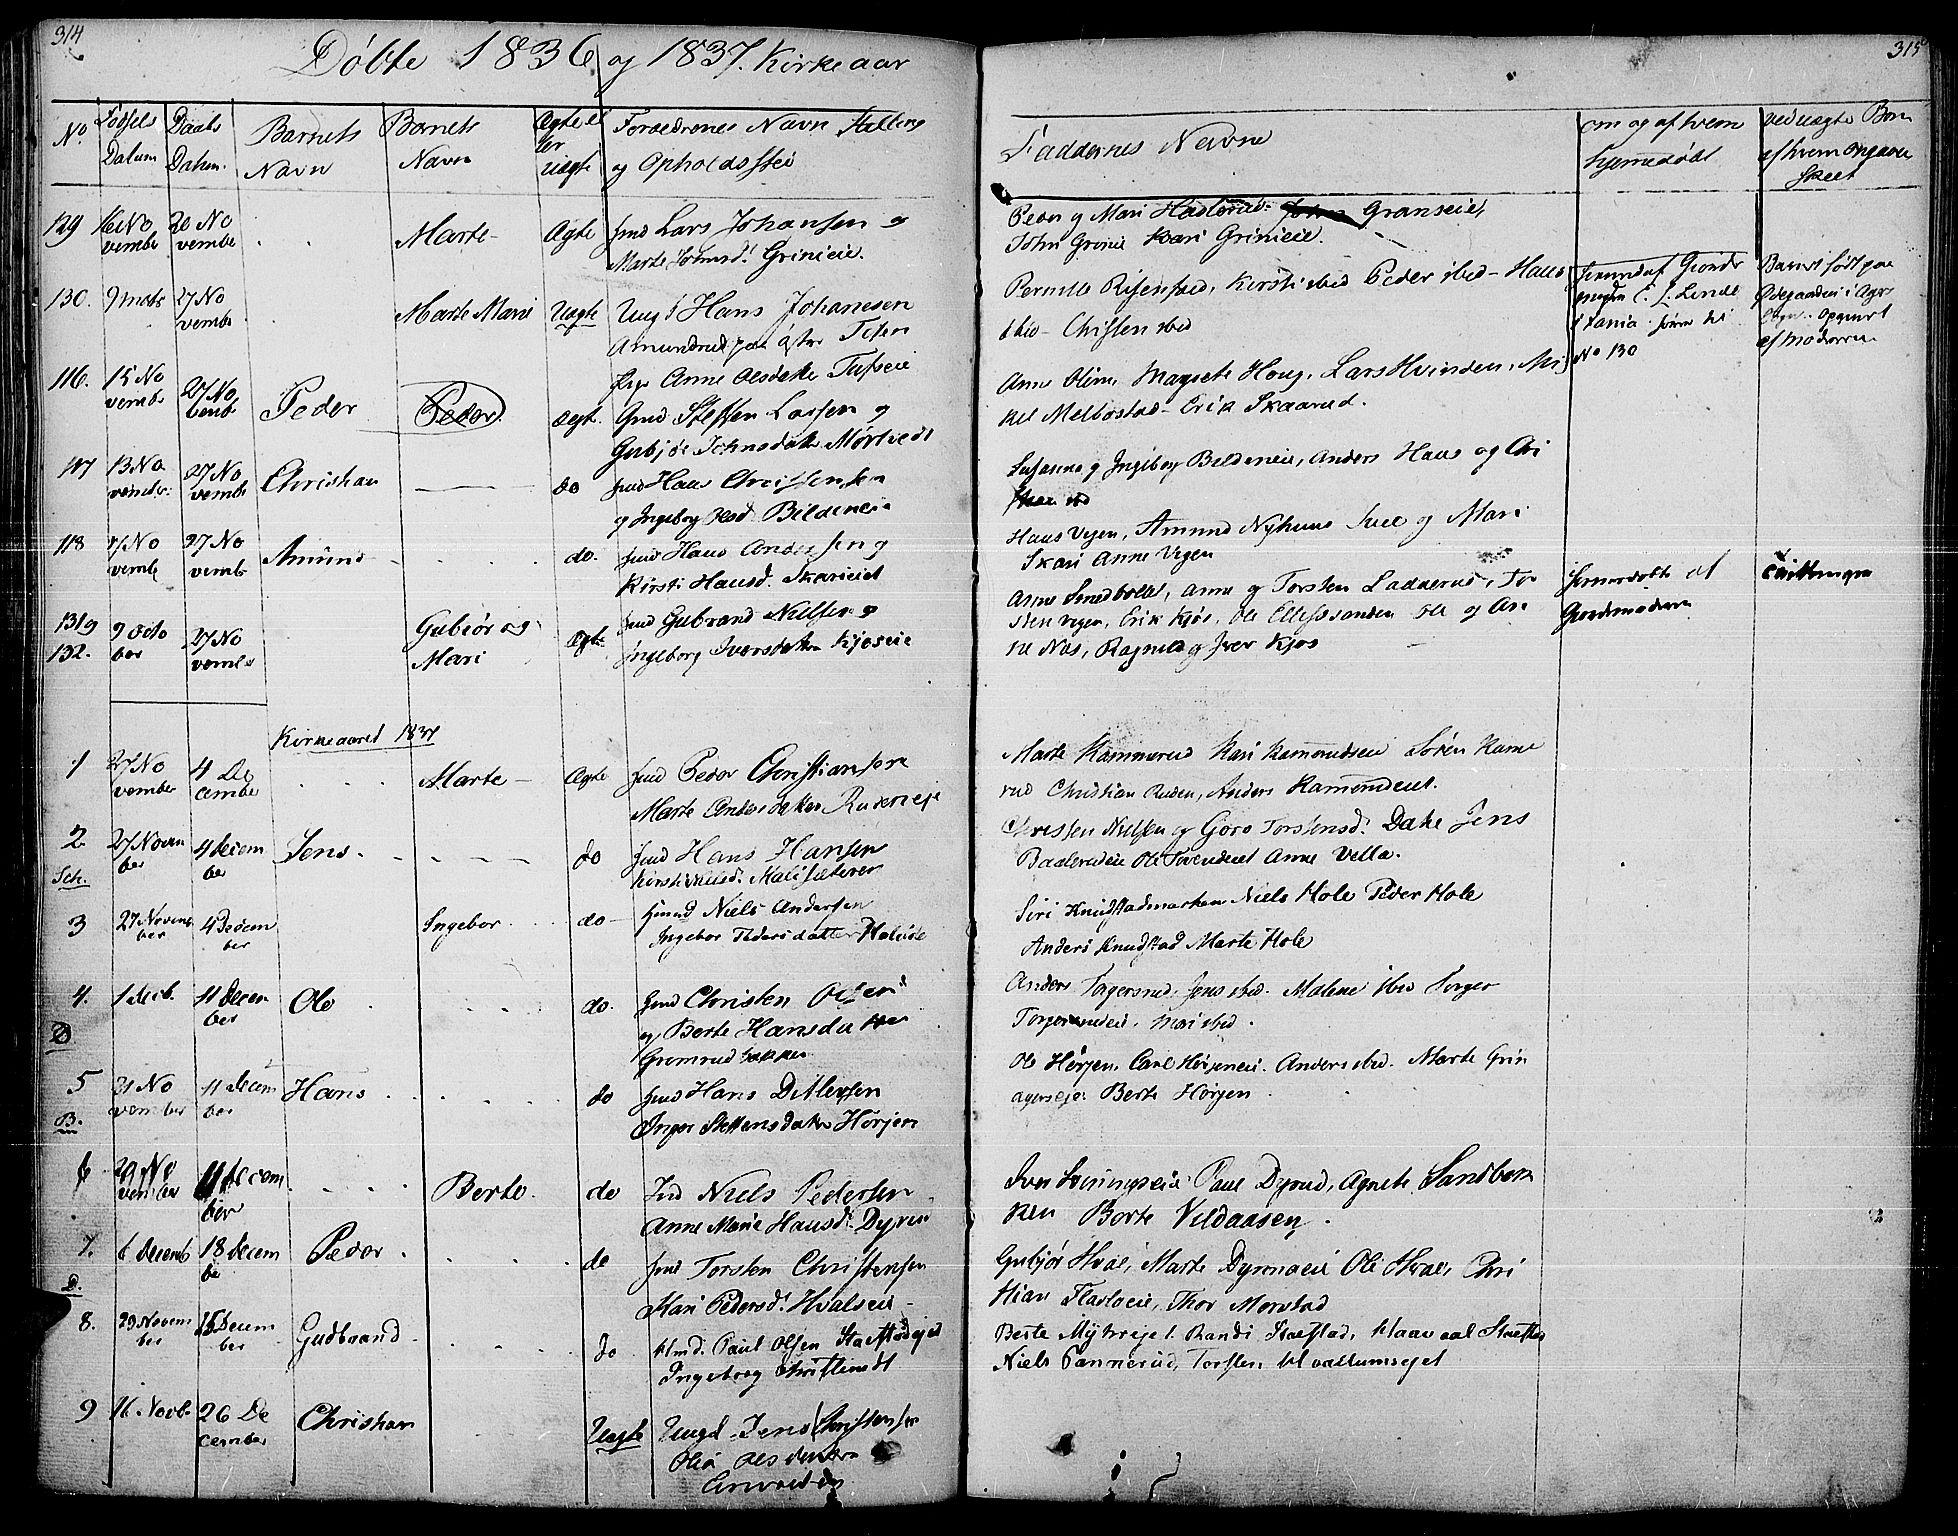 SAH, Gran prestekontor, Ministerialbok nr. 10, 1824-1842, s. 314-315